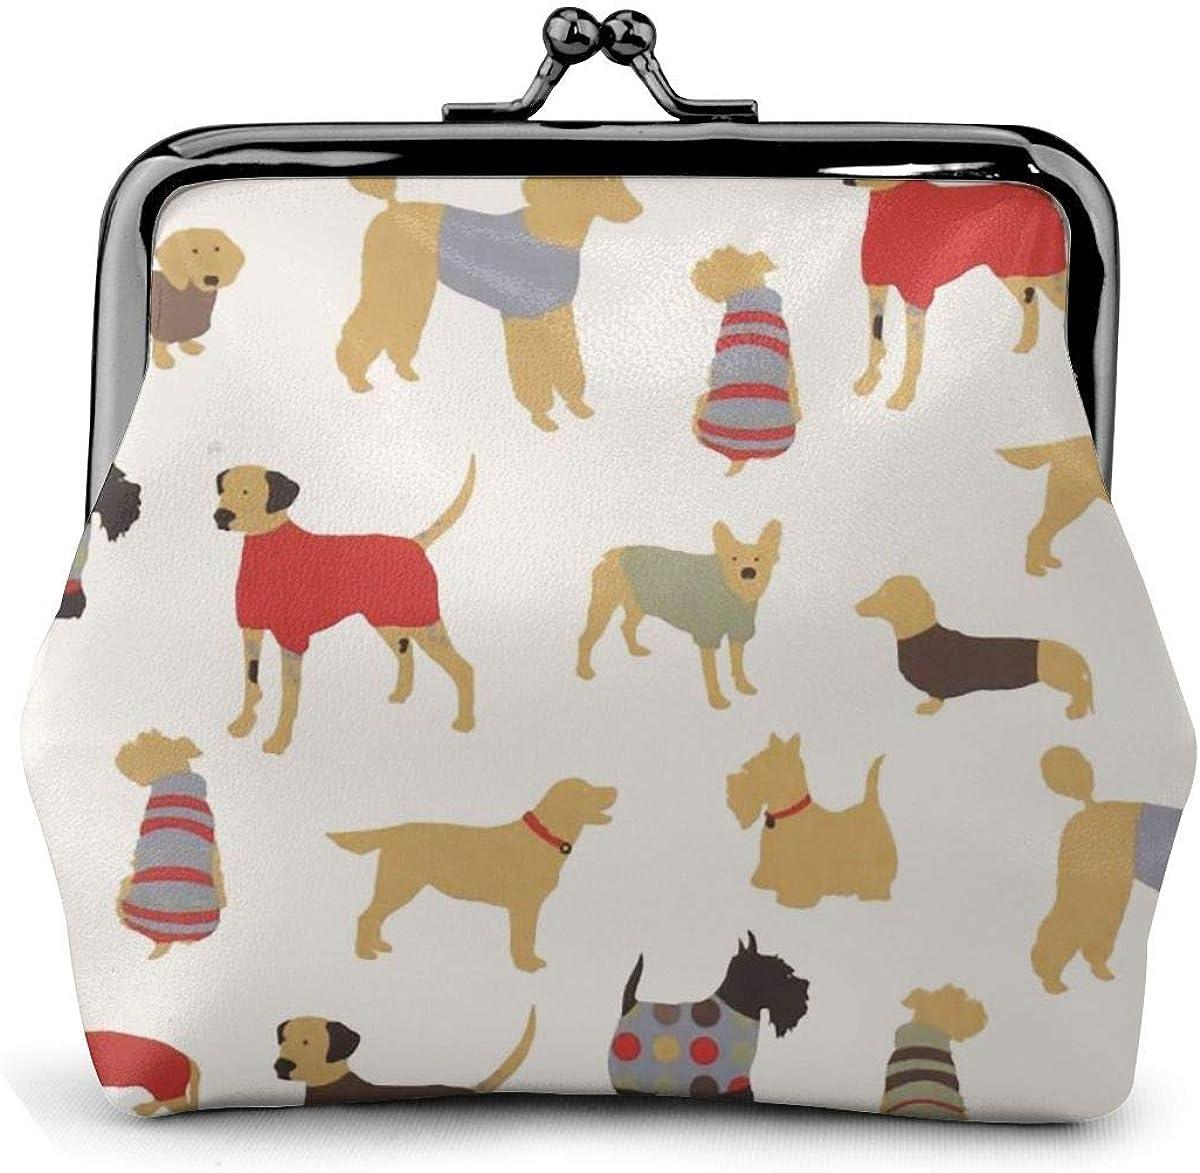 Cheap sale Stingar 4 years warranty Doggy Days Print Leather Coin Pou Lock Purse Kiss Change